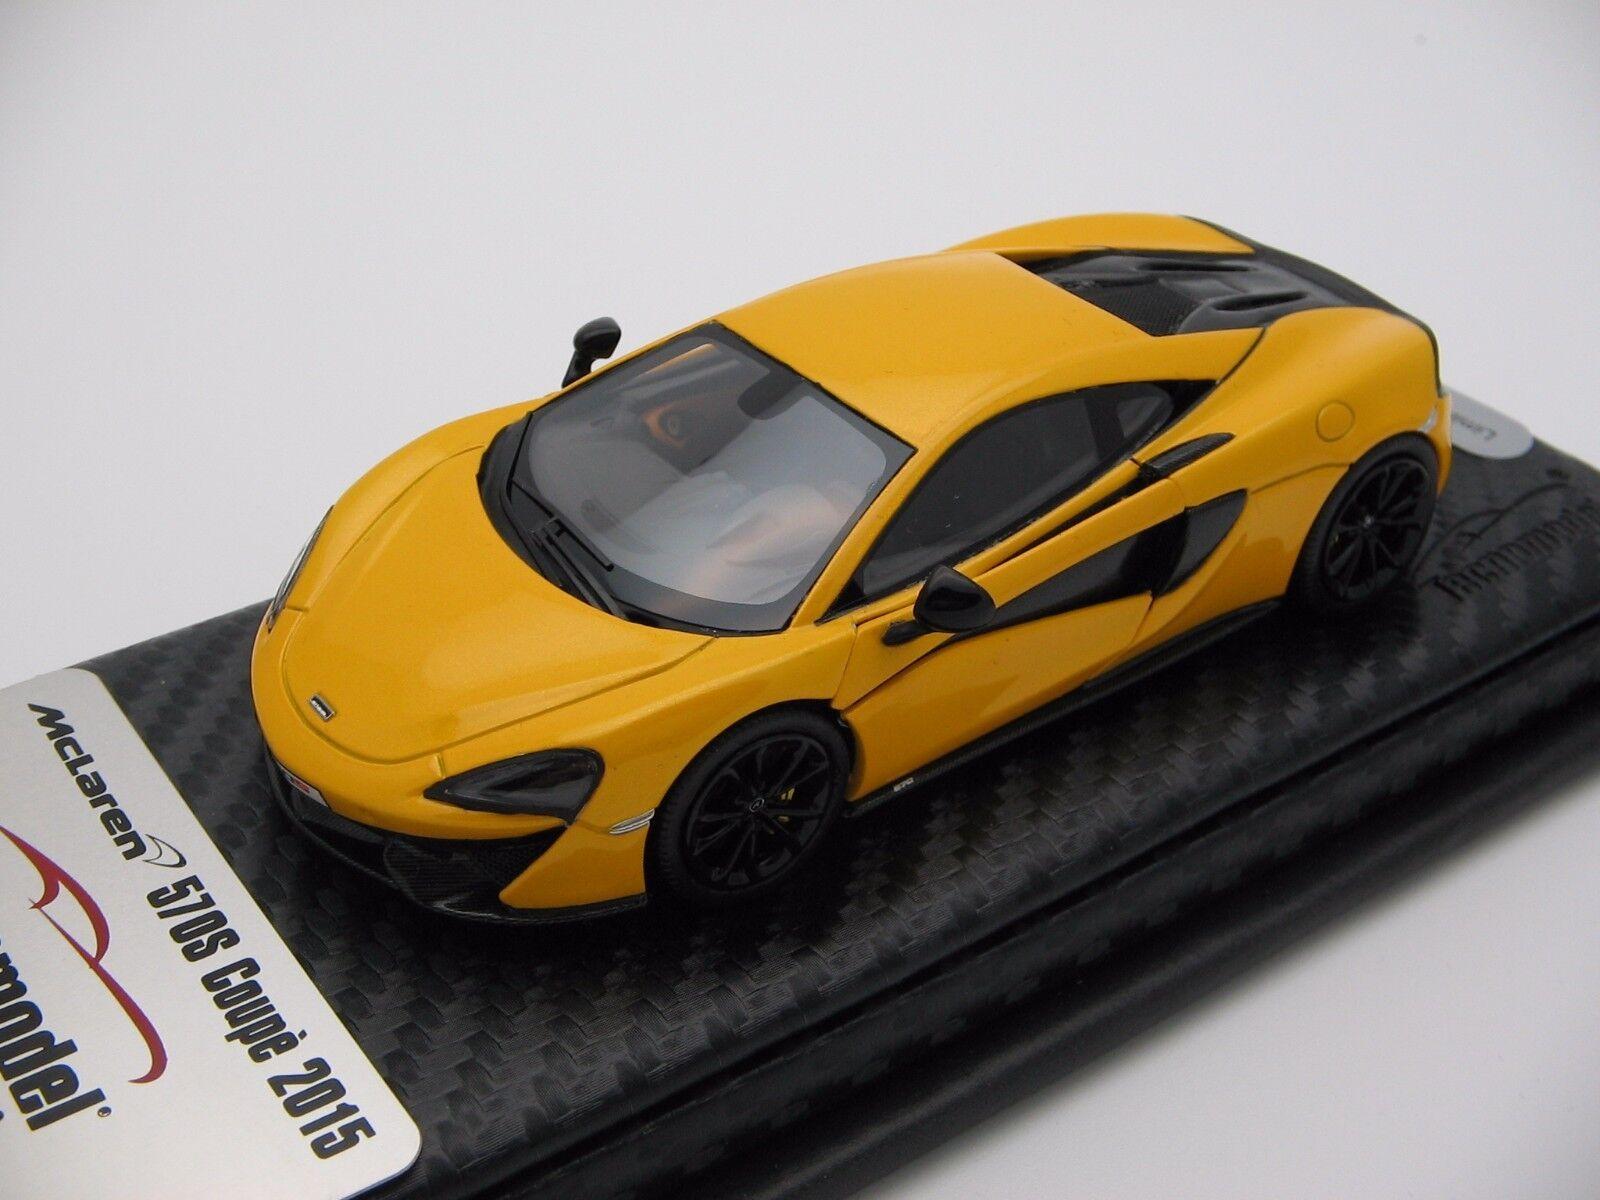 1/43 scale Tecnomodel McLaren 570S Volcano Amarillo 2018 T43-EX02E